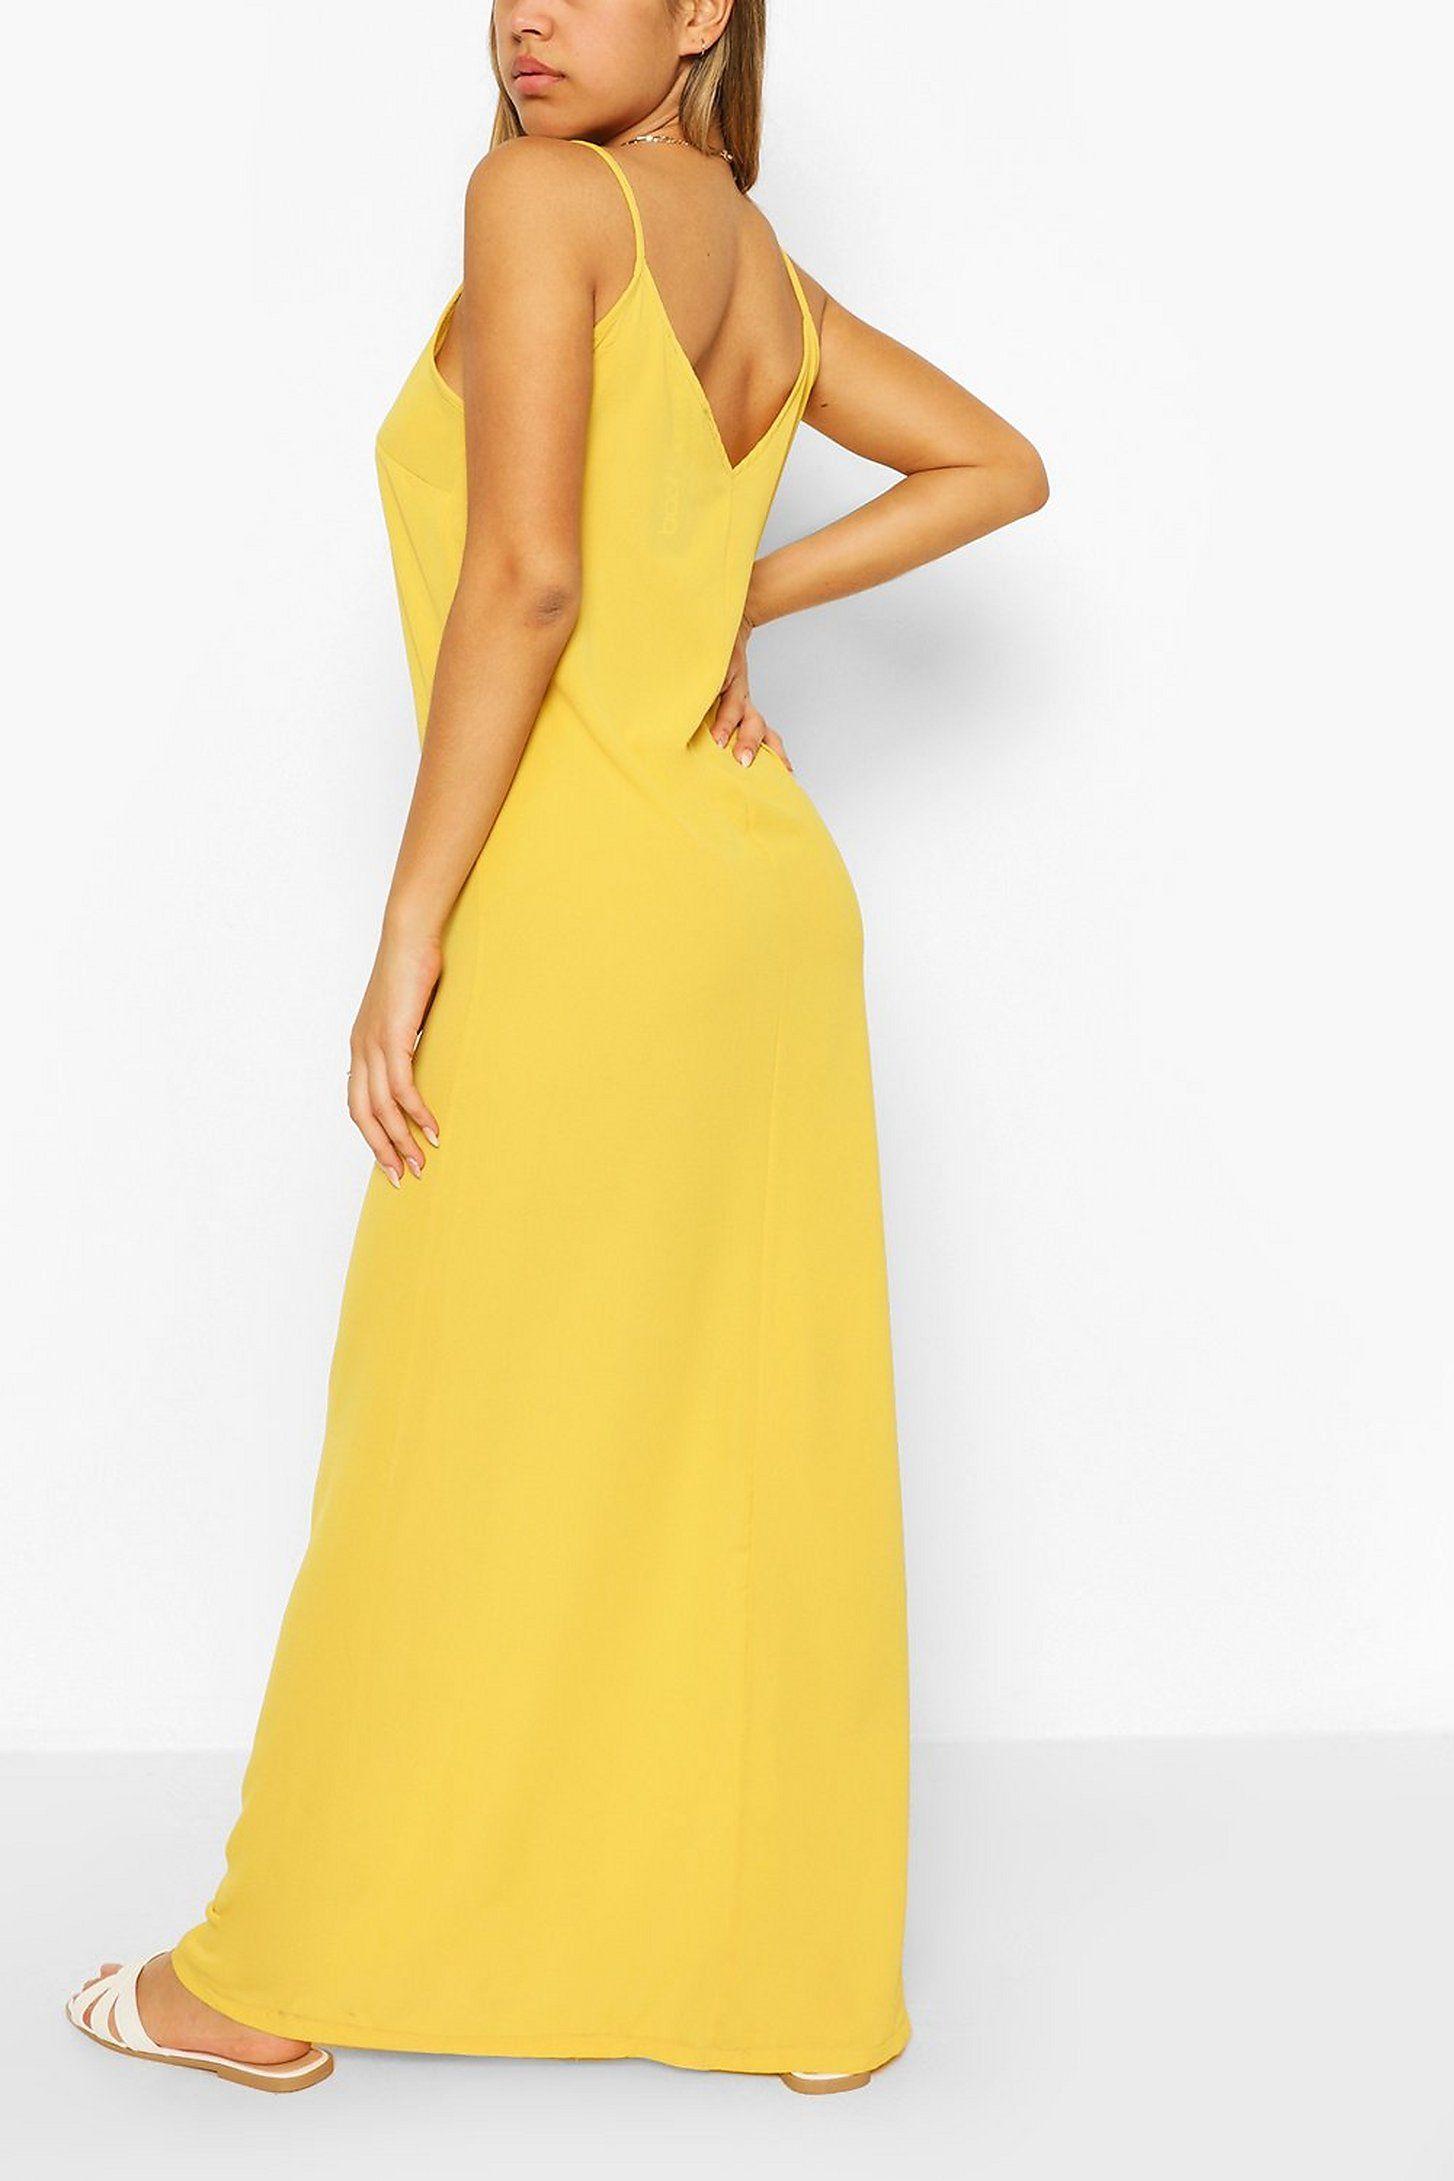 Plain Strappy Maxi Dress Boohoo Maxi Dress Maxi Dress Collection Pink Maxi Dress [ 2181 x 1454 Pixel ]